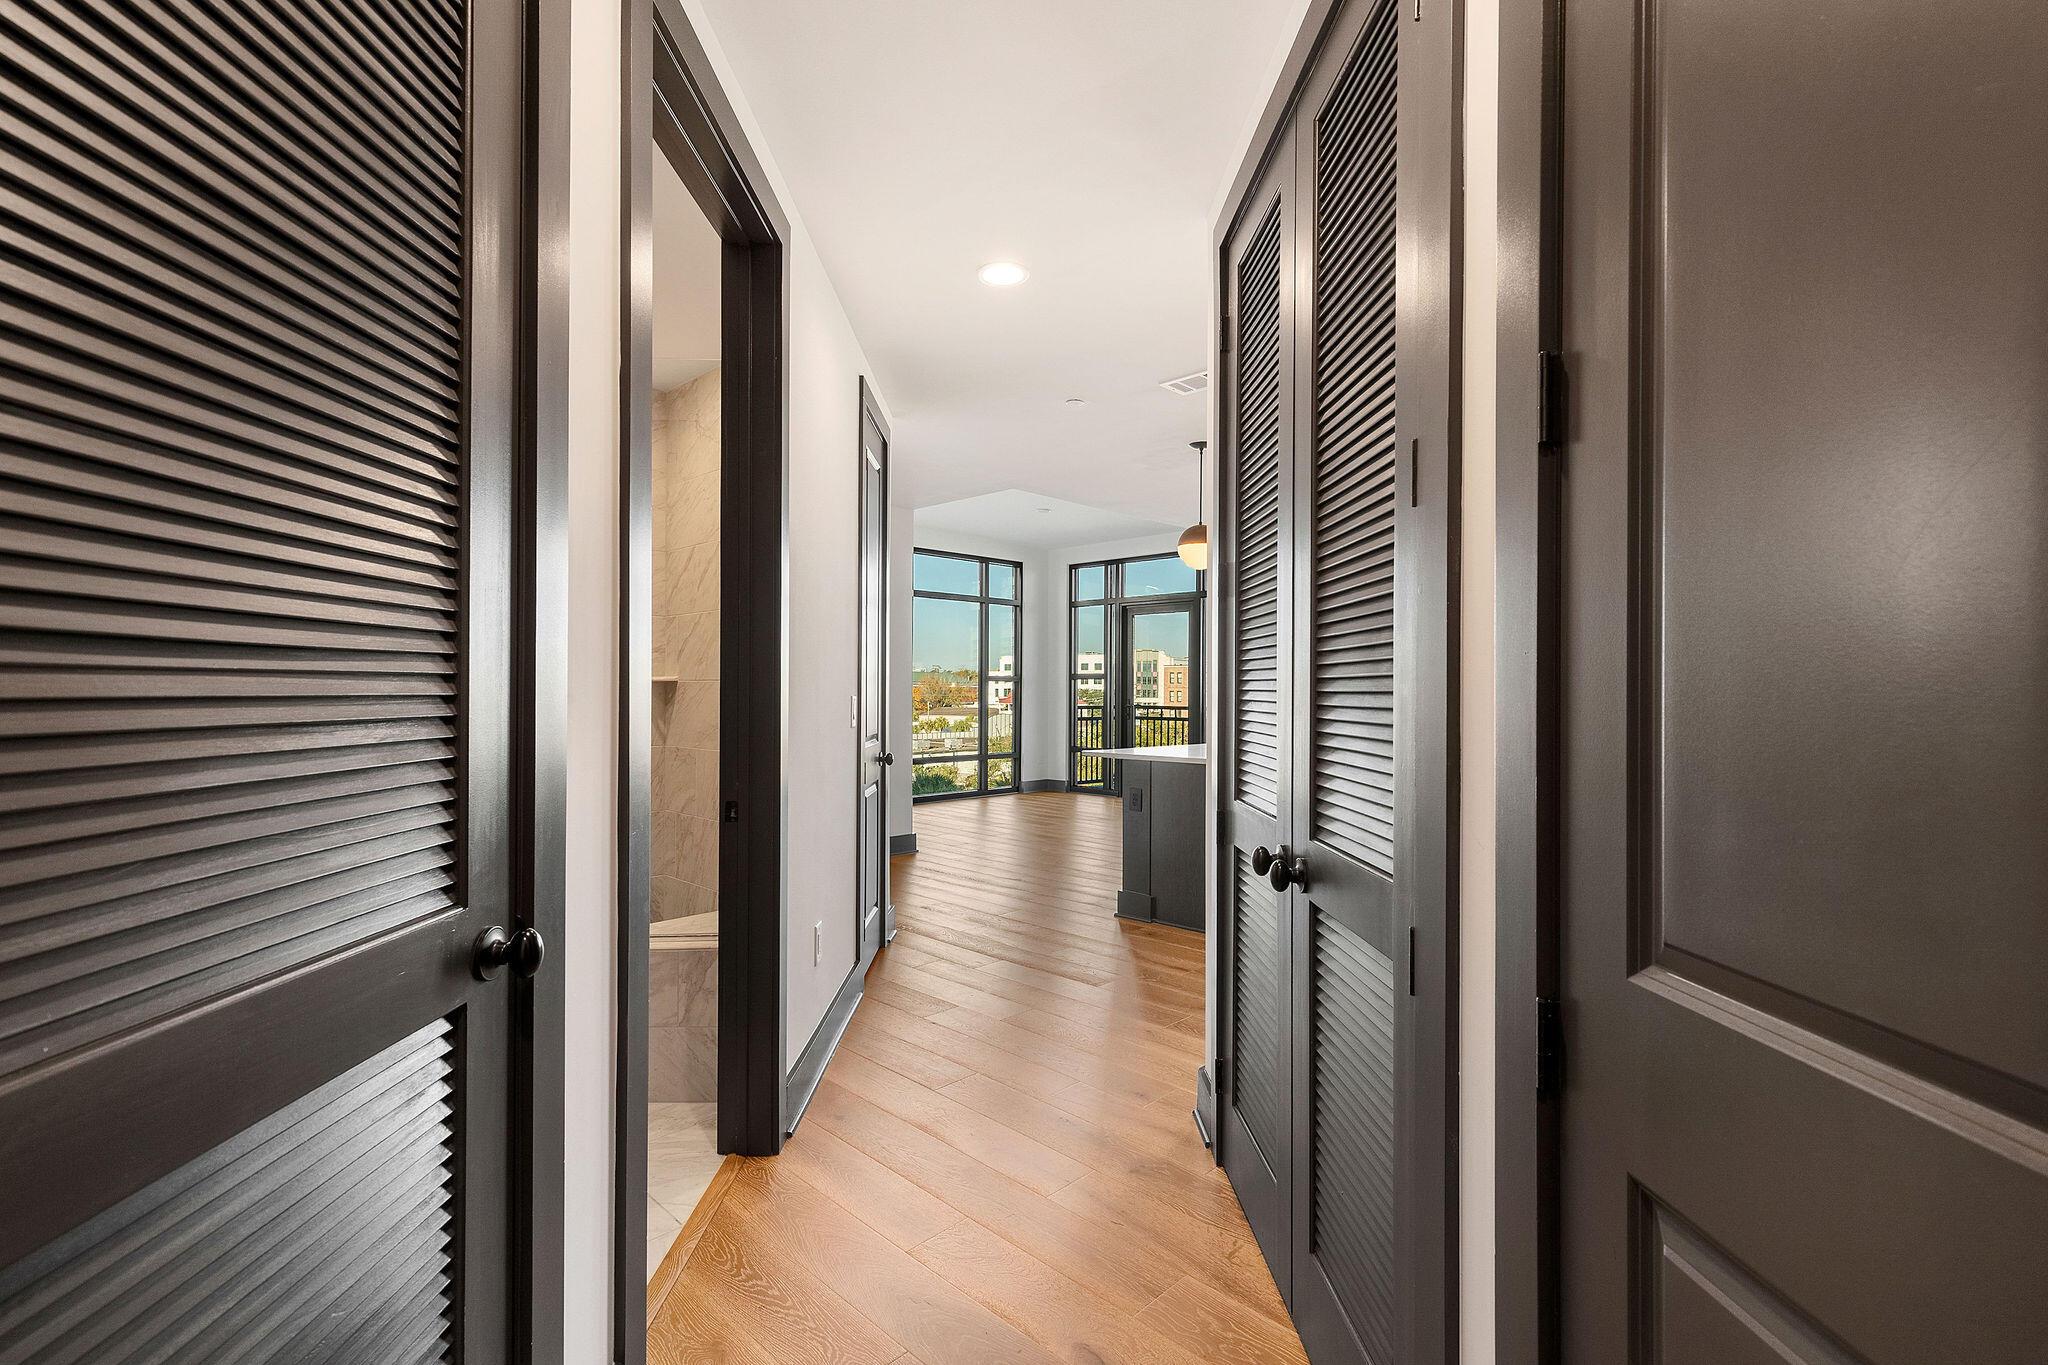 5 Gadsdenboro Street, Charleston, 29401, 2 Bedrooms Bedrooms, ,2 BathroomsBathrooms,Residential,For Sale,Gadsdenboro,21014900